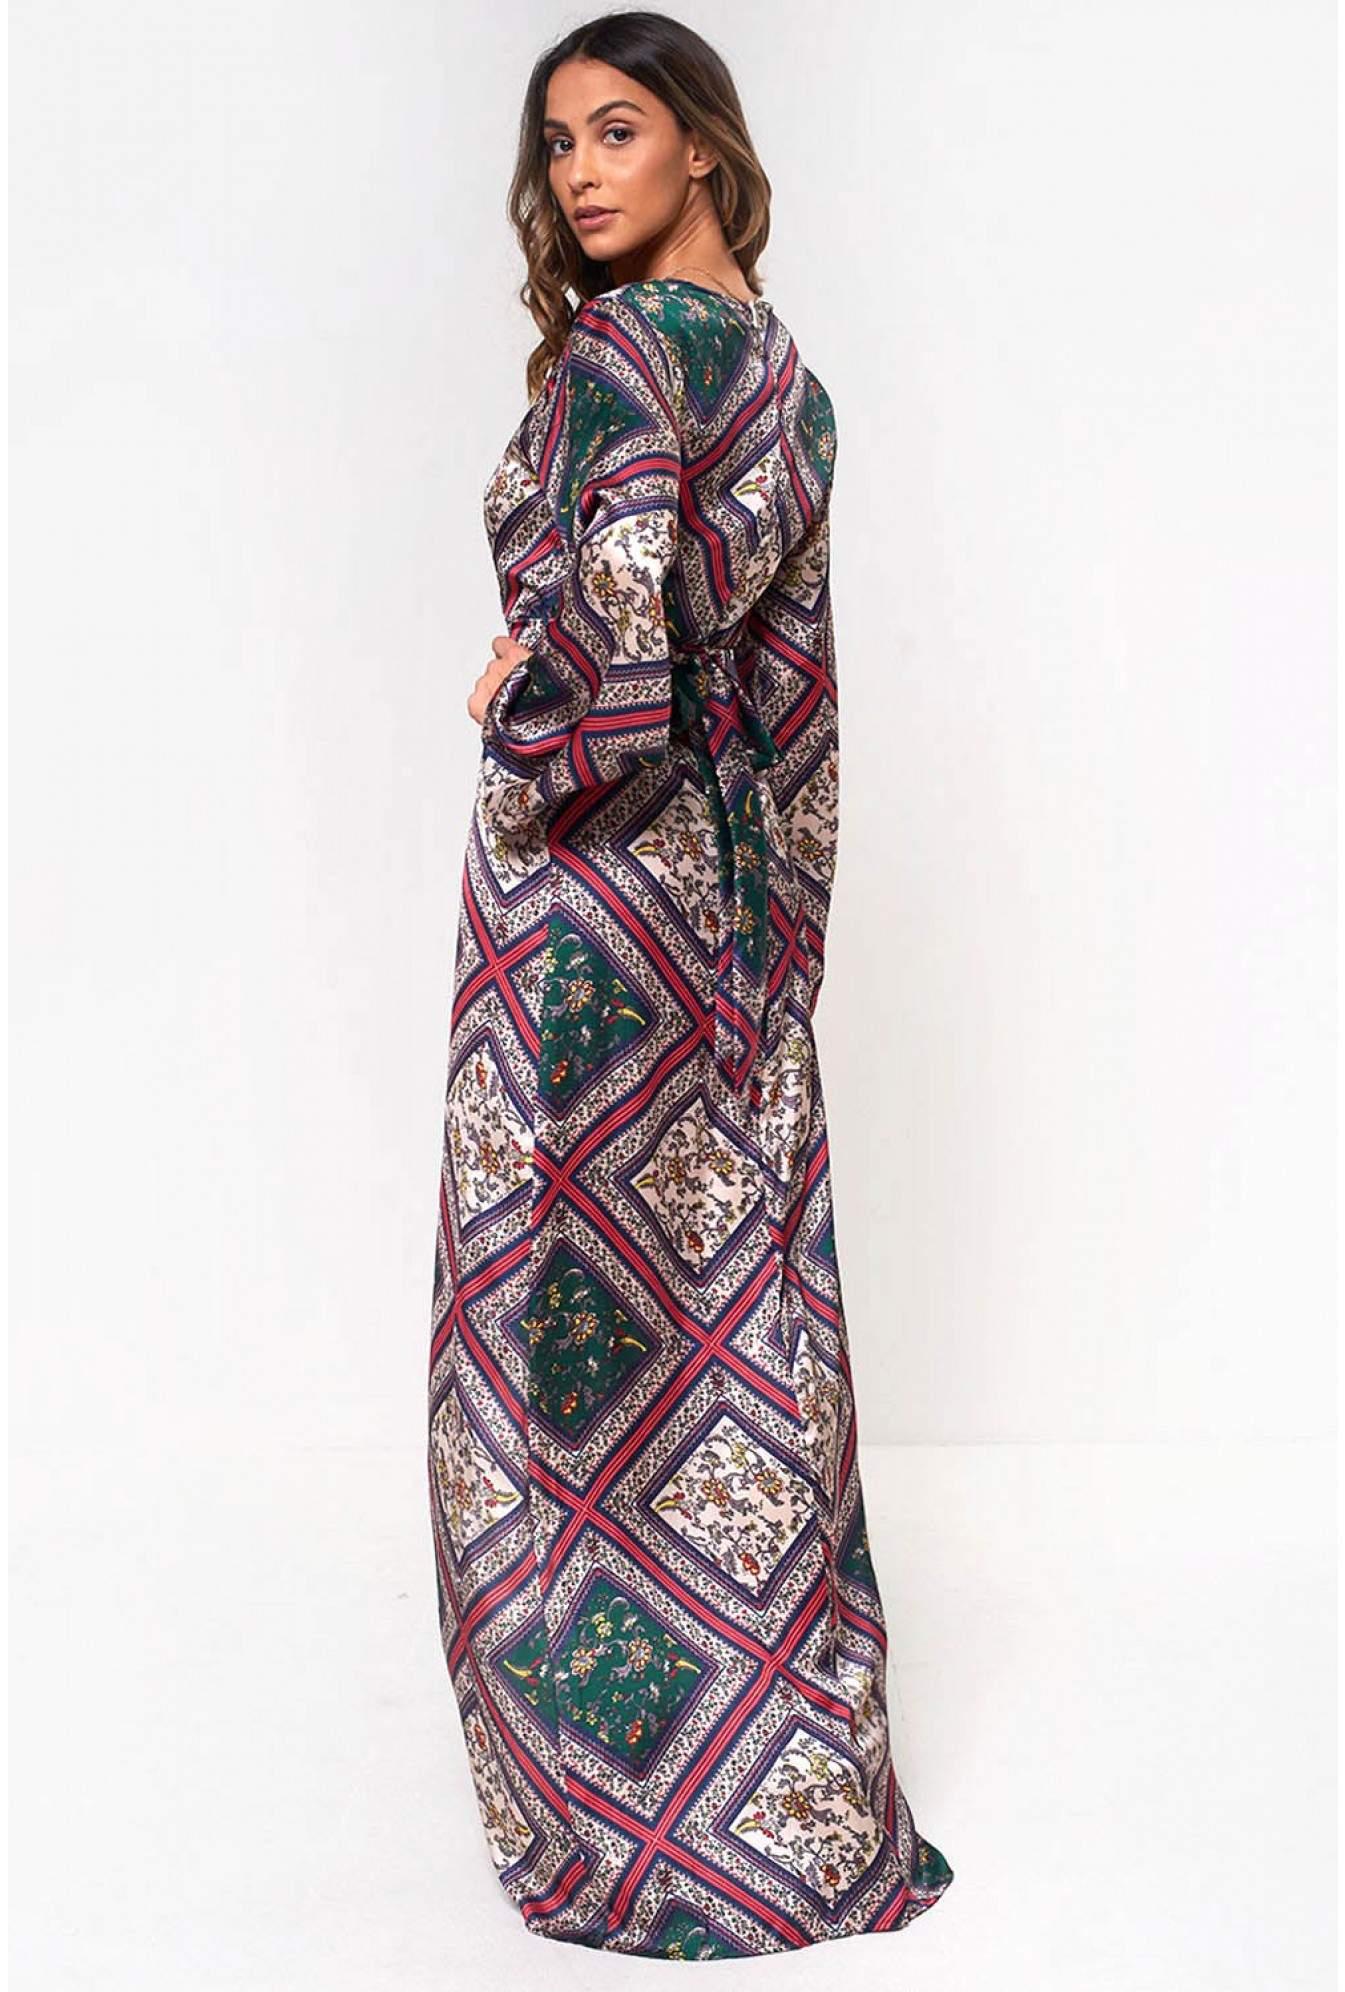 5b7a2062da Shikha Lila Printed Satin Maxi Dress   iCLOTHING